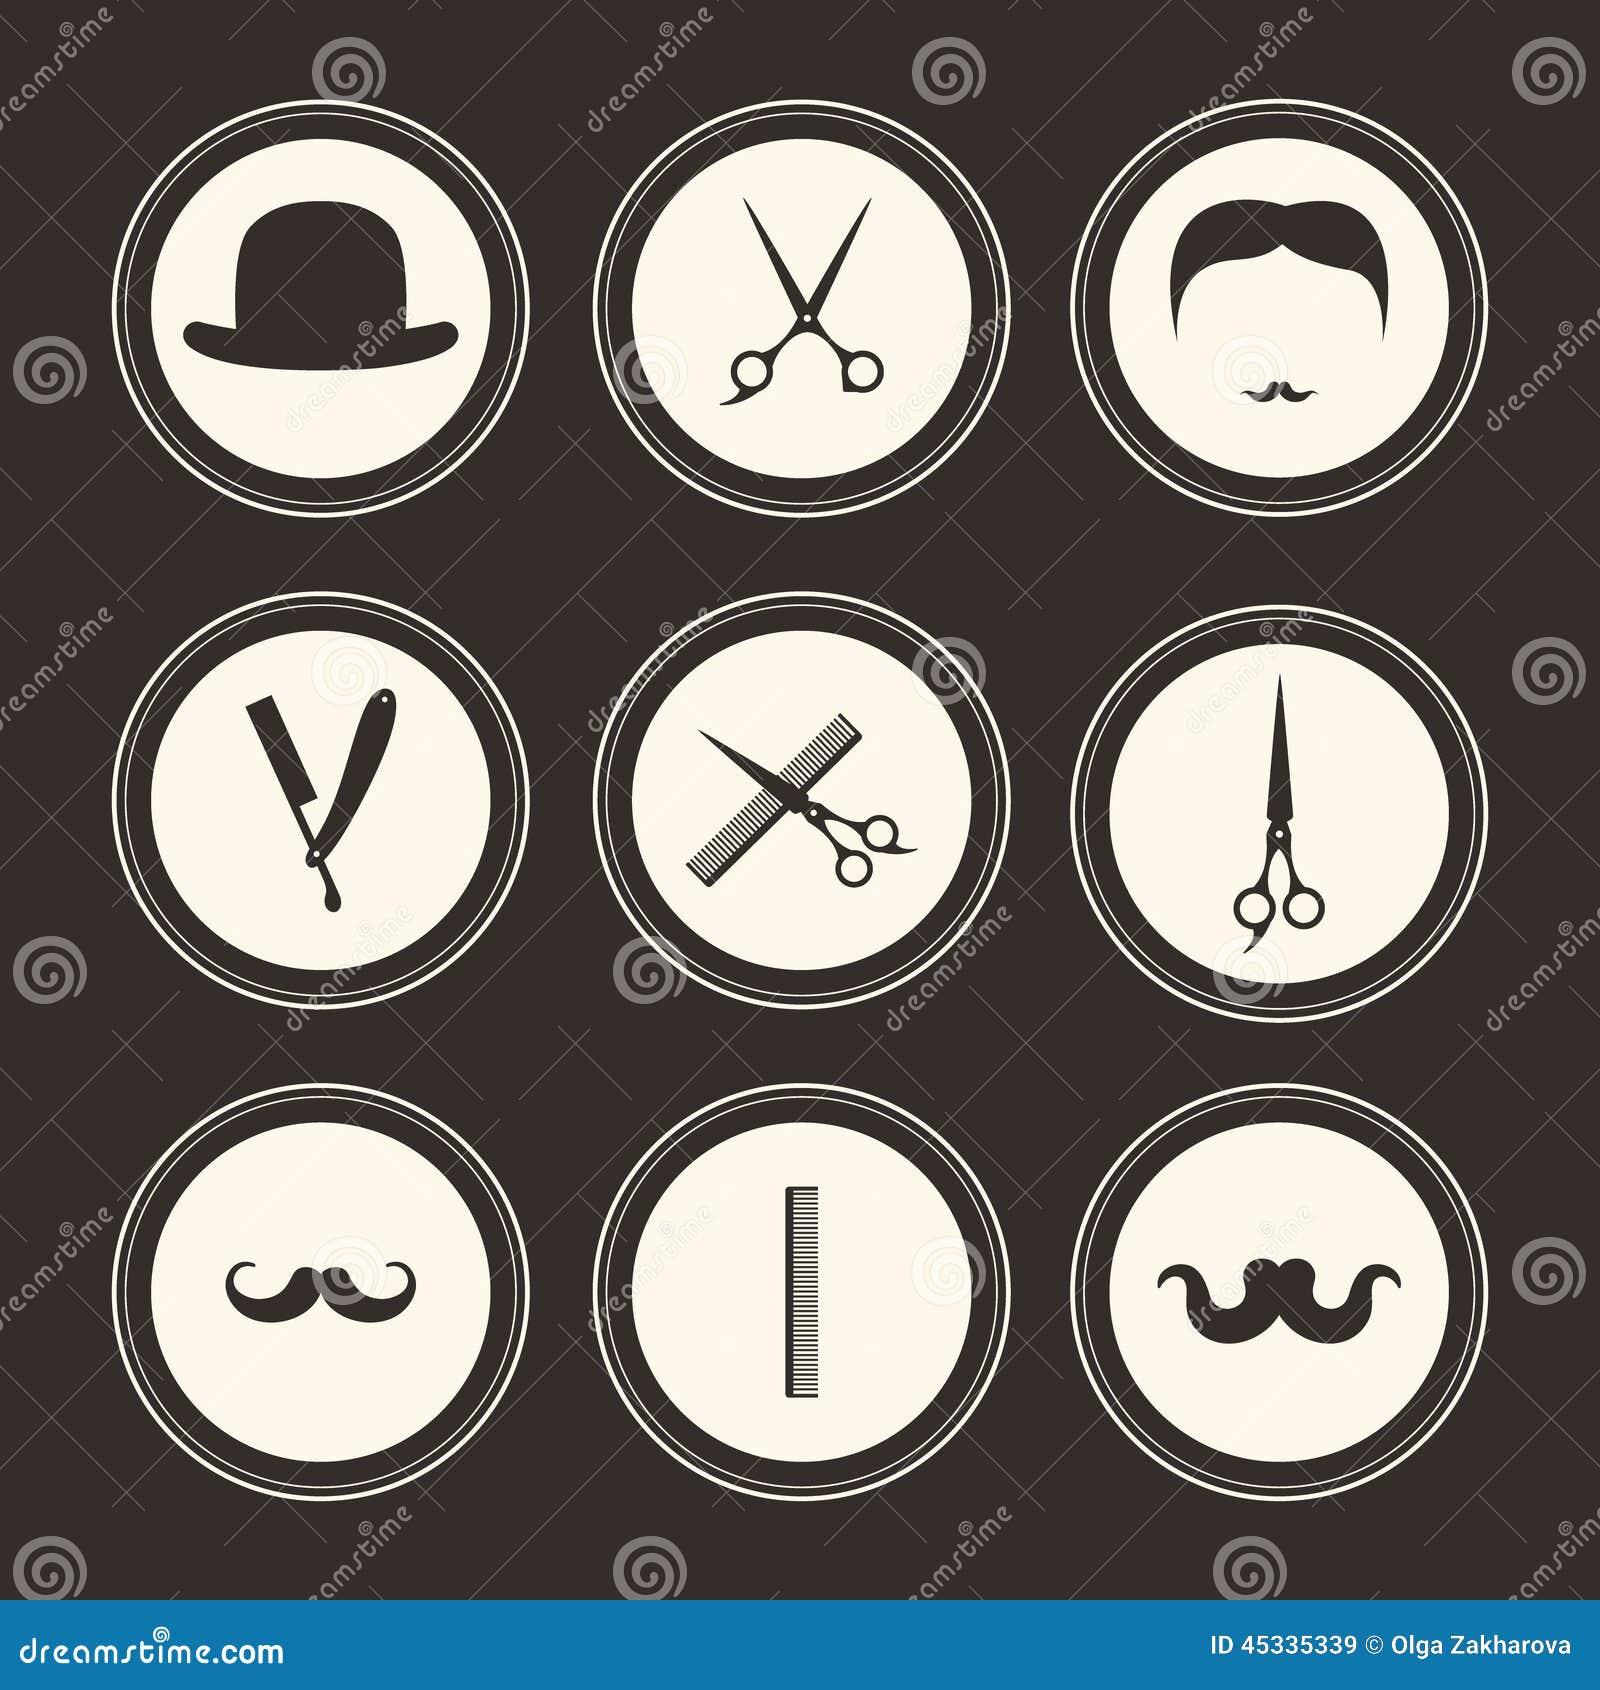 Barber Logos Stock Vector - Image: 45335339